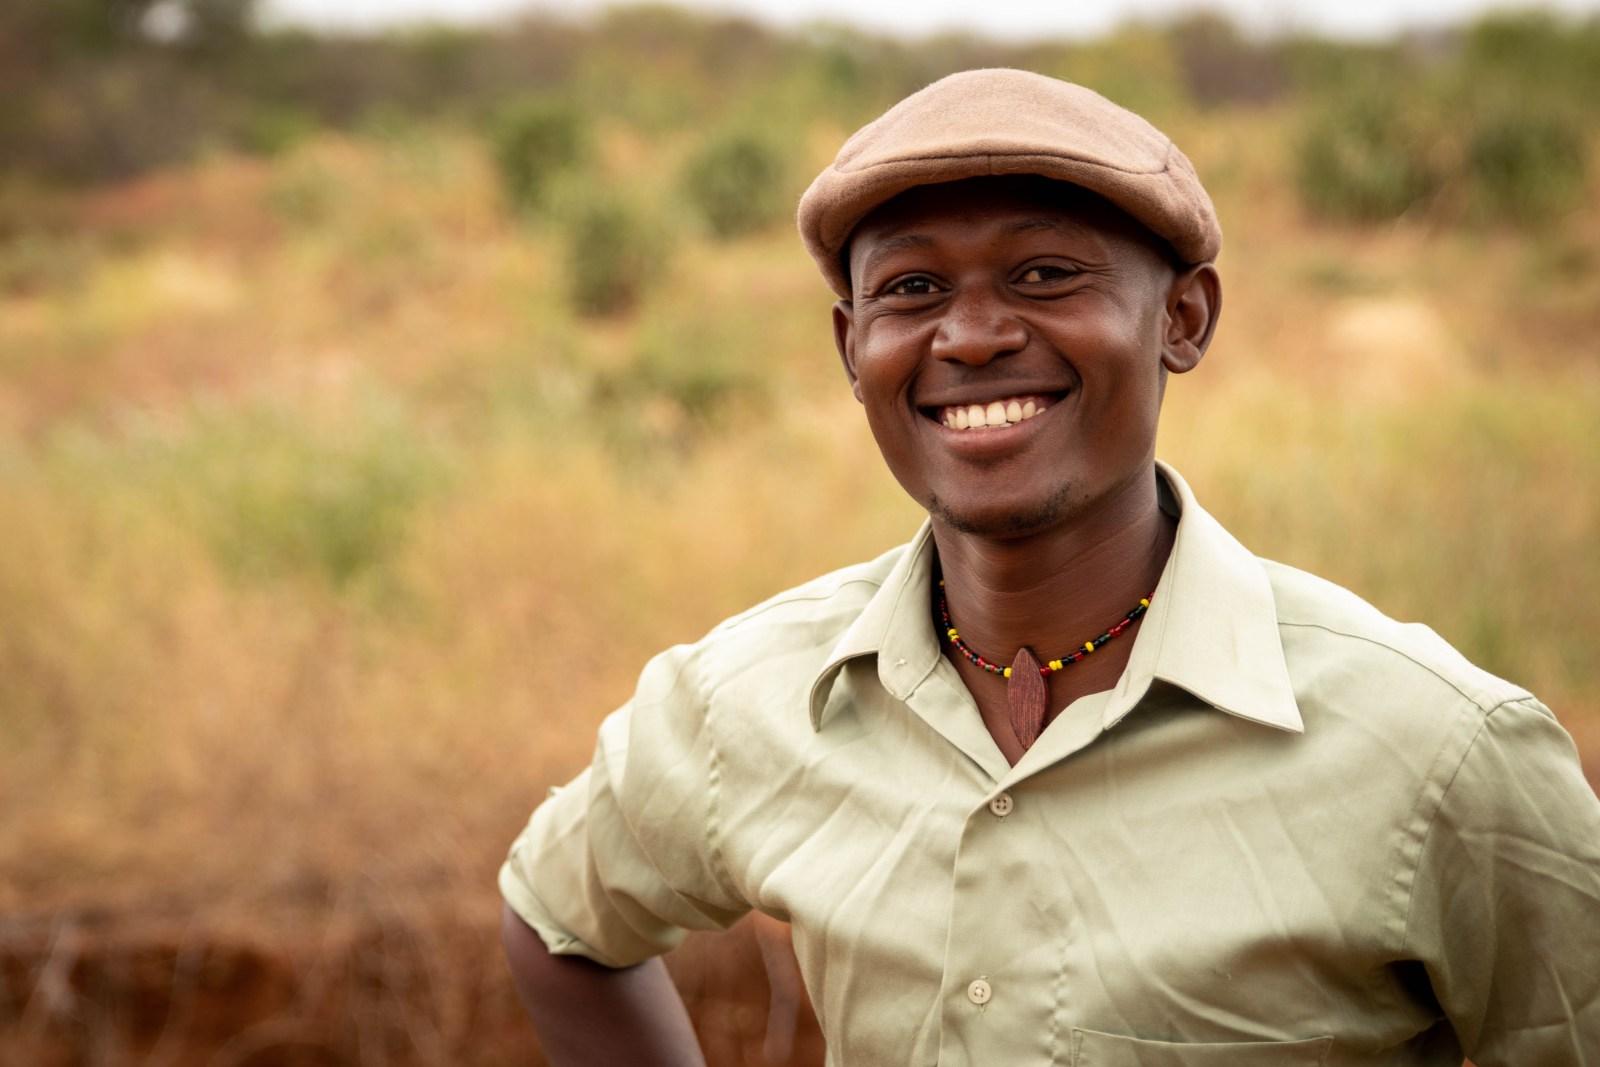 Bonden, Joseph Kimanzi, vars gård blivit delad i två